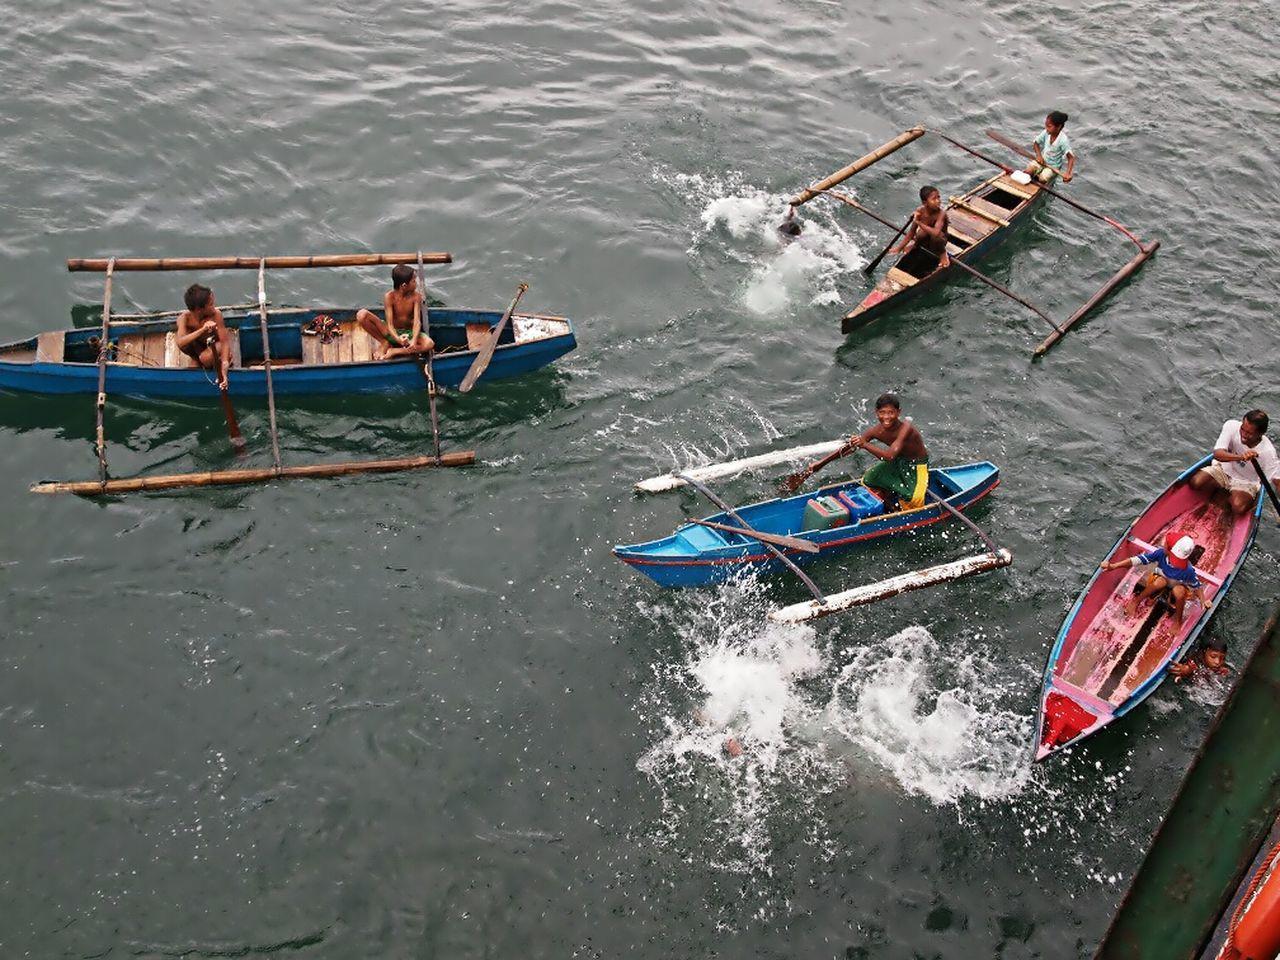 Sea Boat Vintas Sea Gypsies Sea Gypsy Basilan Badjaos Fun Divestreetphotography Dive Indigenouspeople Indigenouscommunity